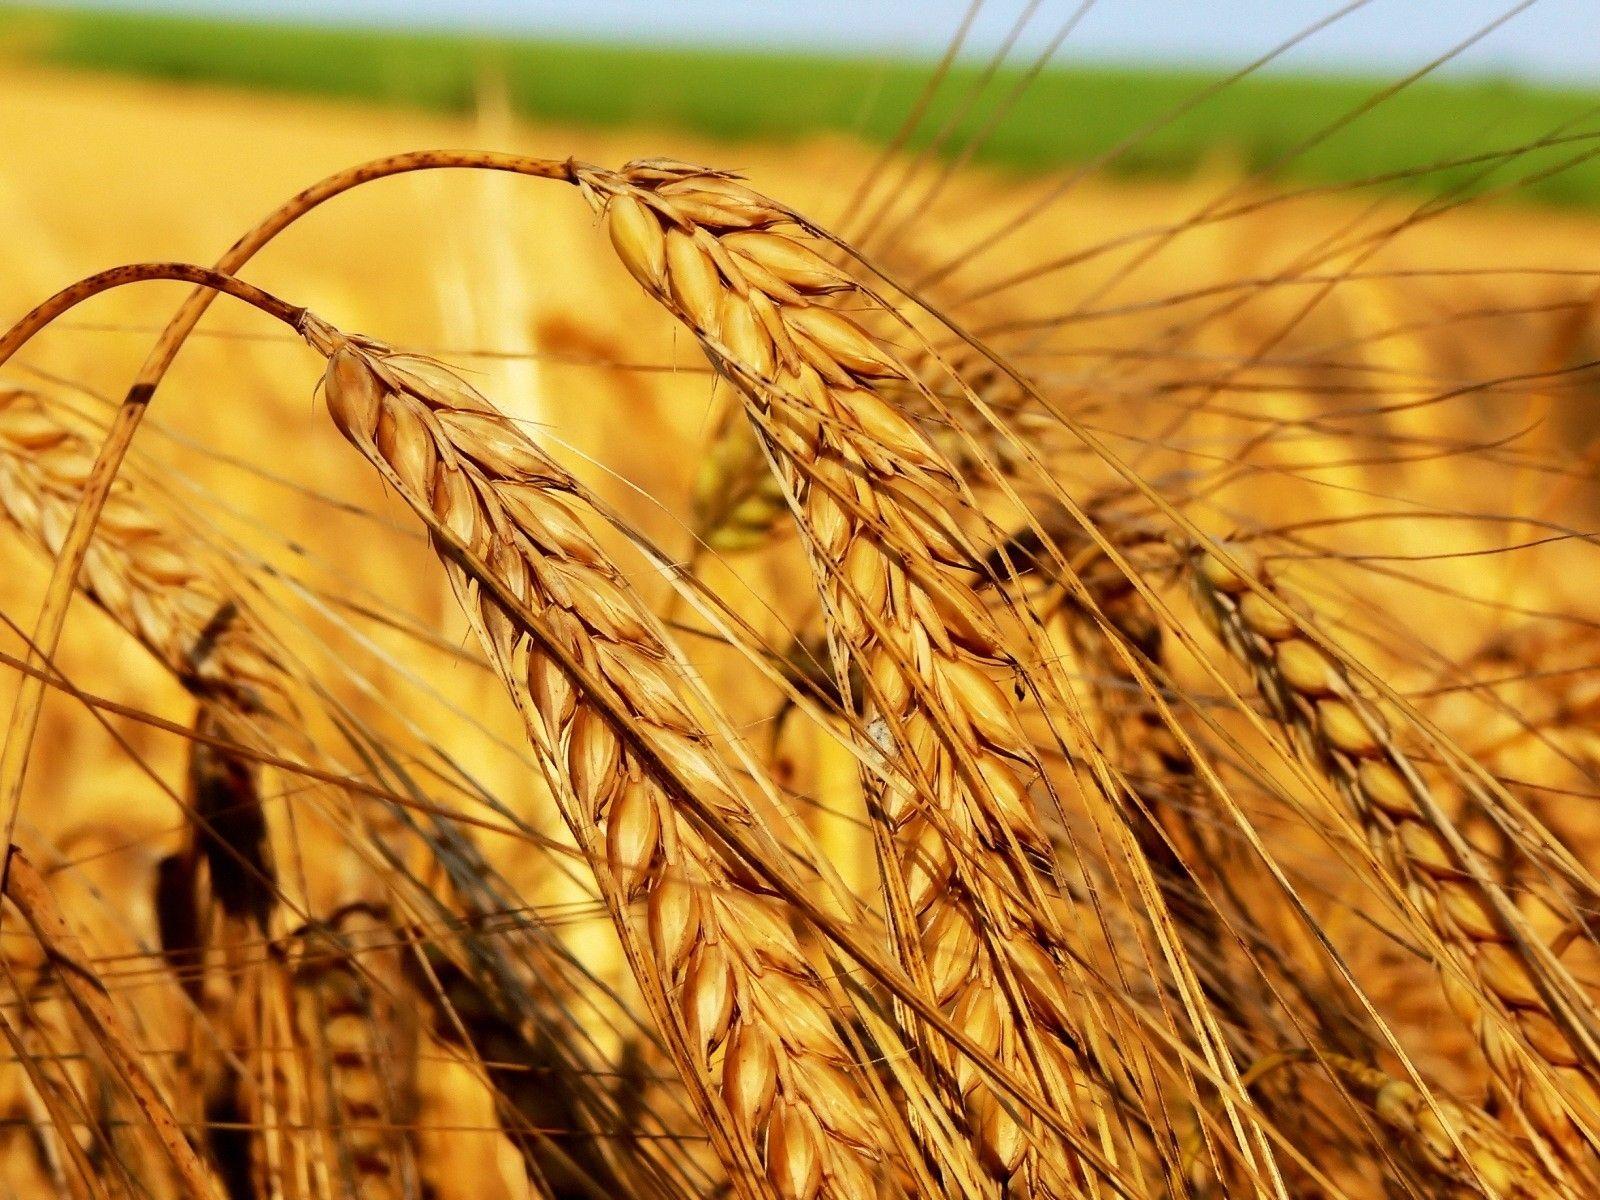 field_ears_agriculture_crop_grain_42484_1600x1200.jpg